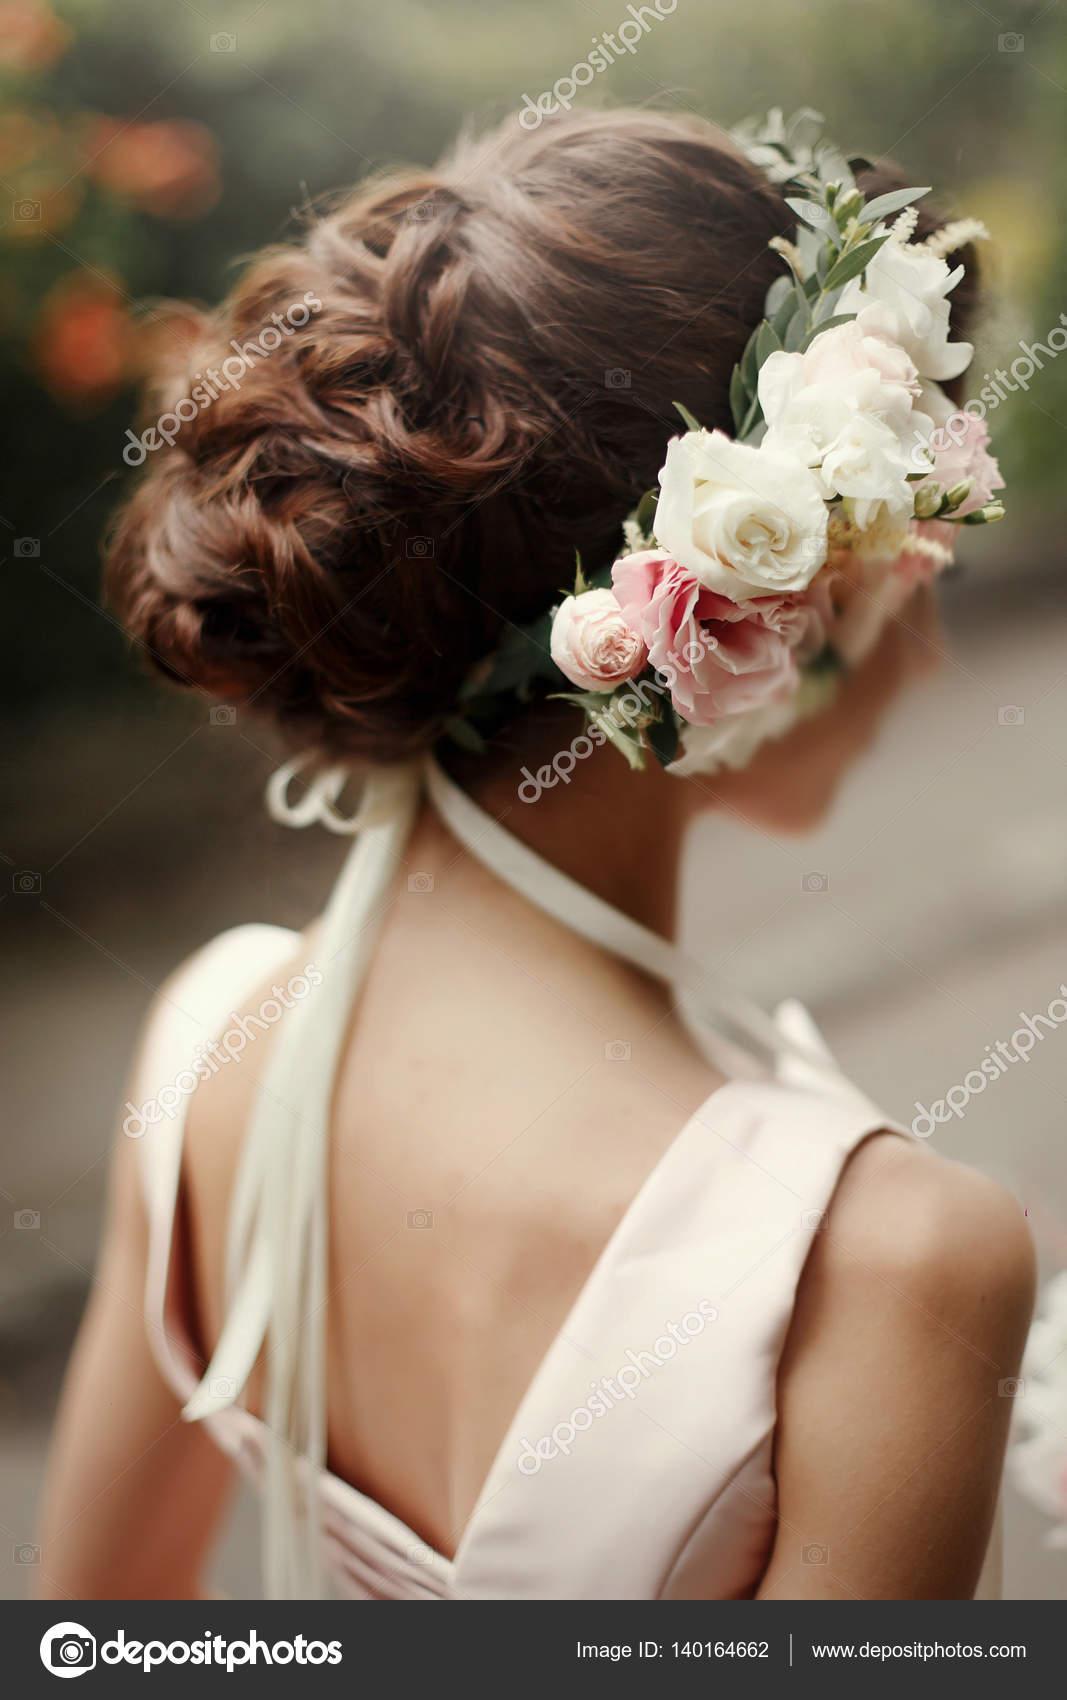 Rosa Blumenkranz Braut Haar Stockfoto C Sonyachny 140164662